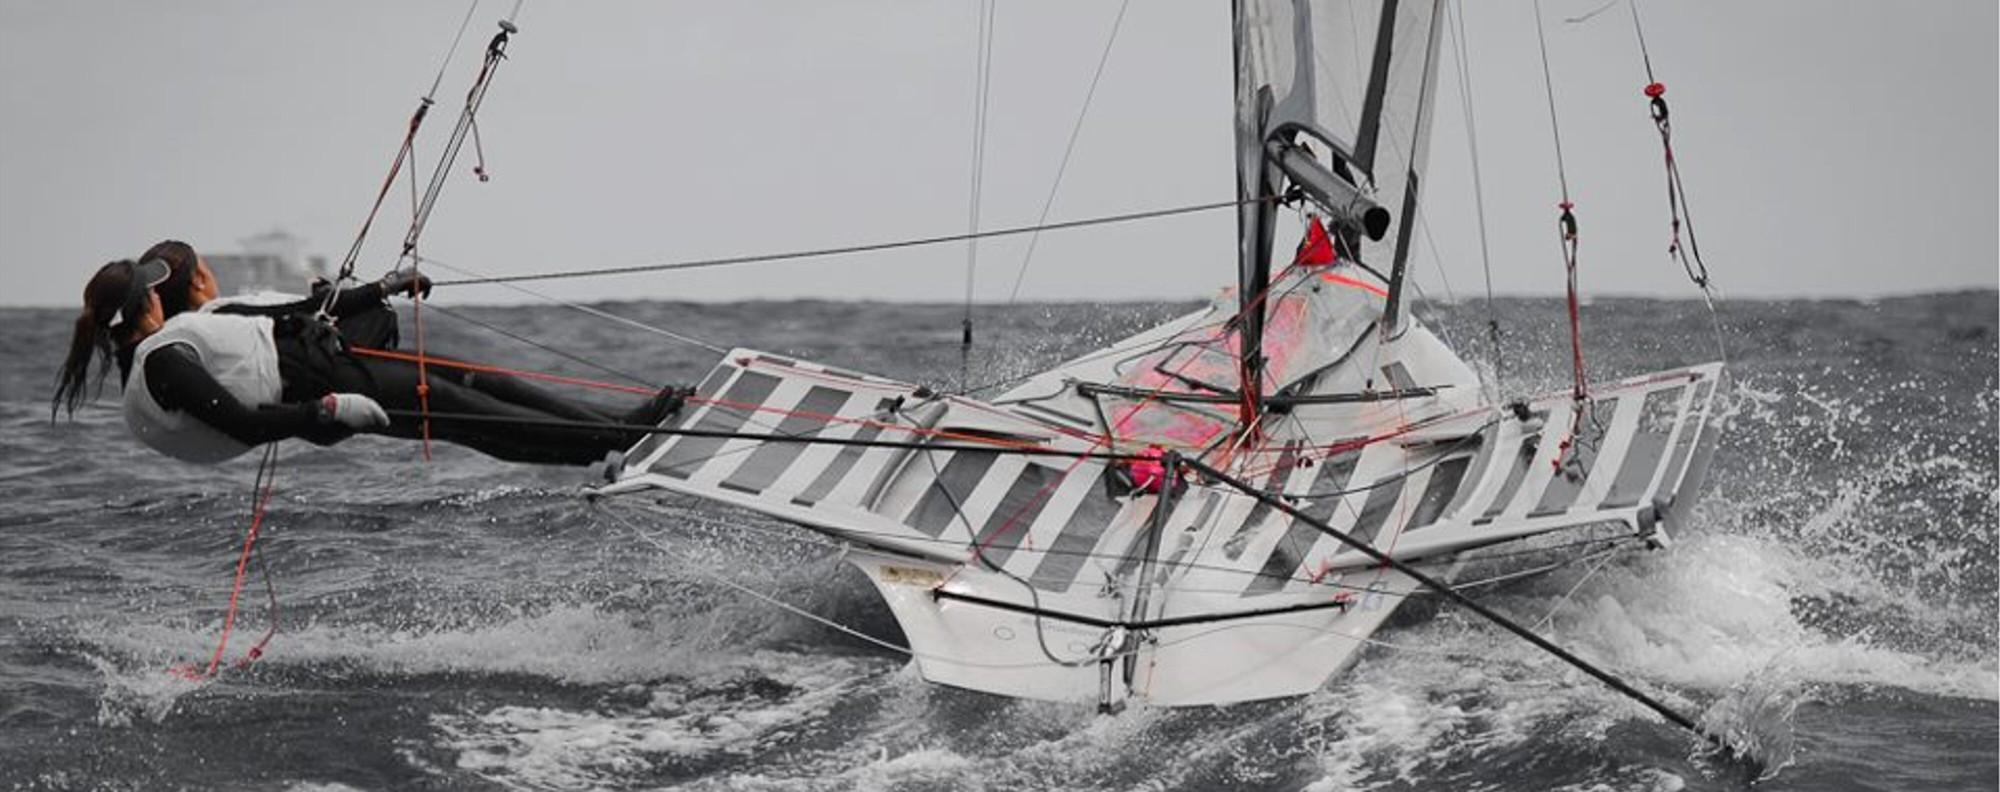 Maria Cantero a member of the Royal Hong Kong Yacht Club (RHKYC) Team Agiplast. Photo: Alberto Sanchez